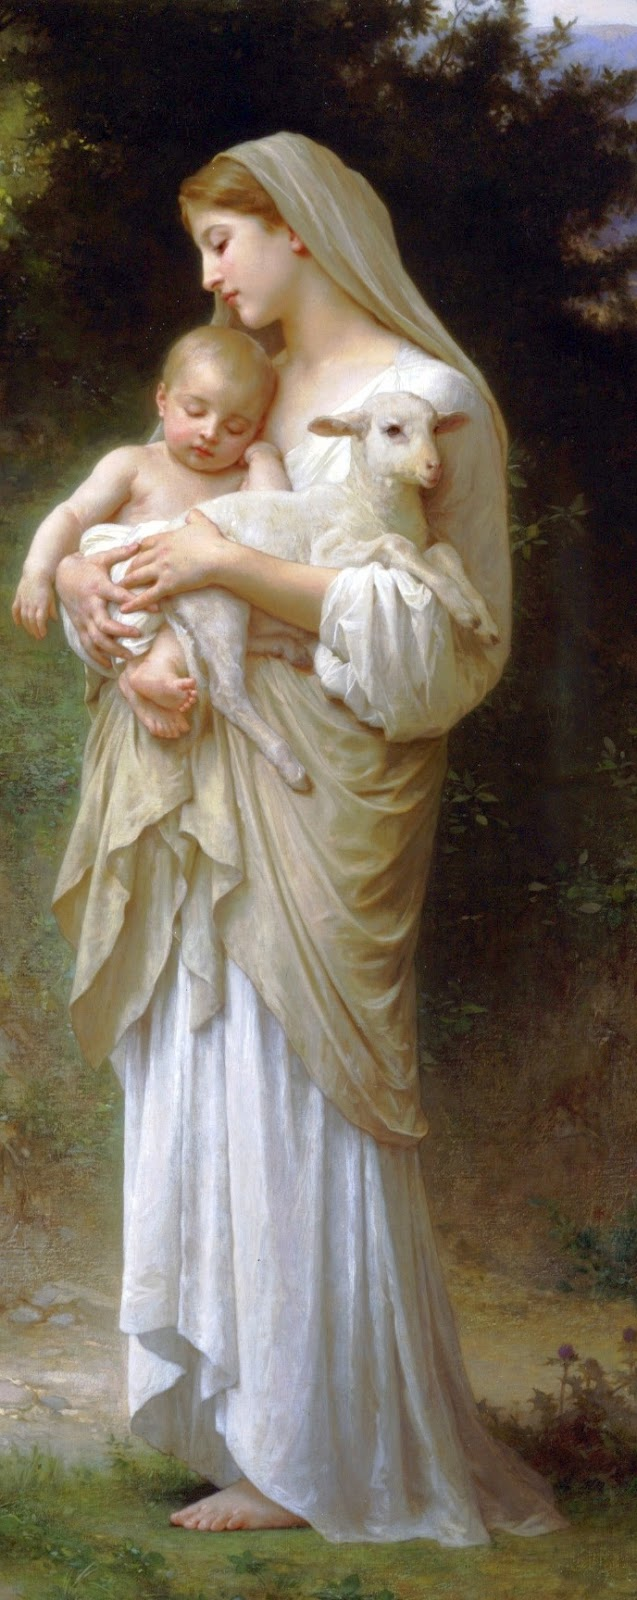 innocence, William Adolphe Bouguereau,5 stars